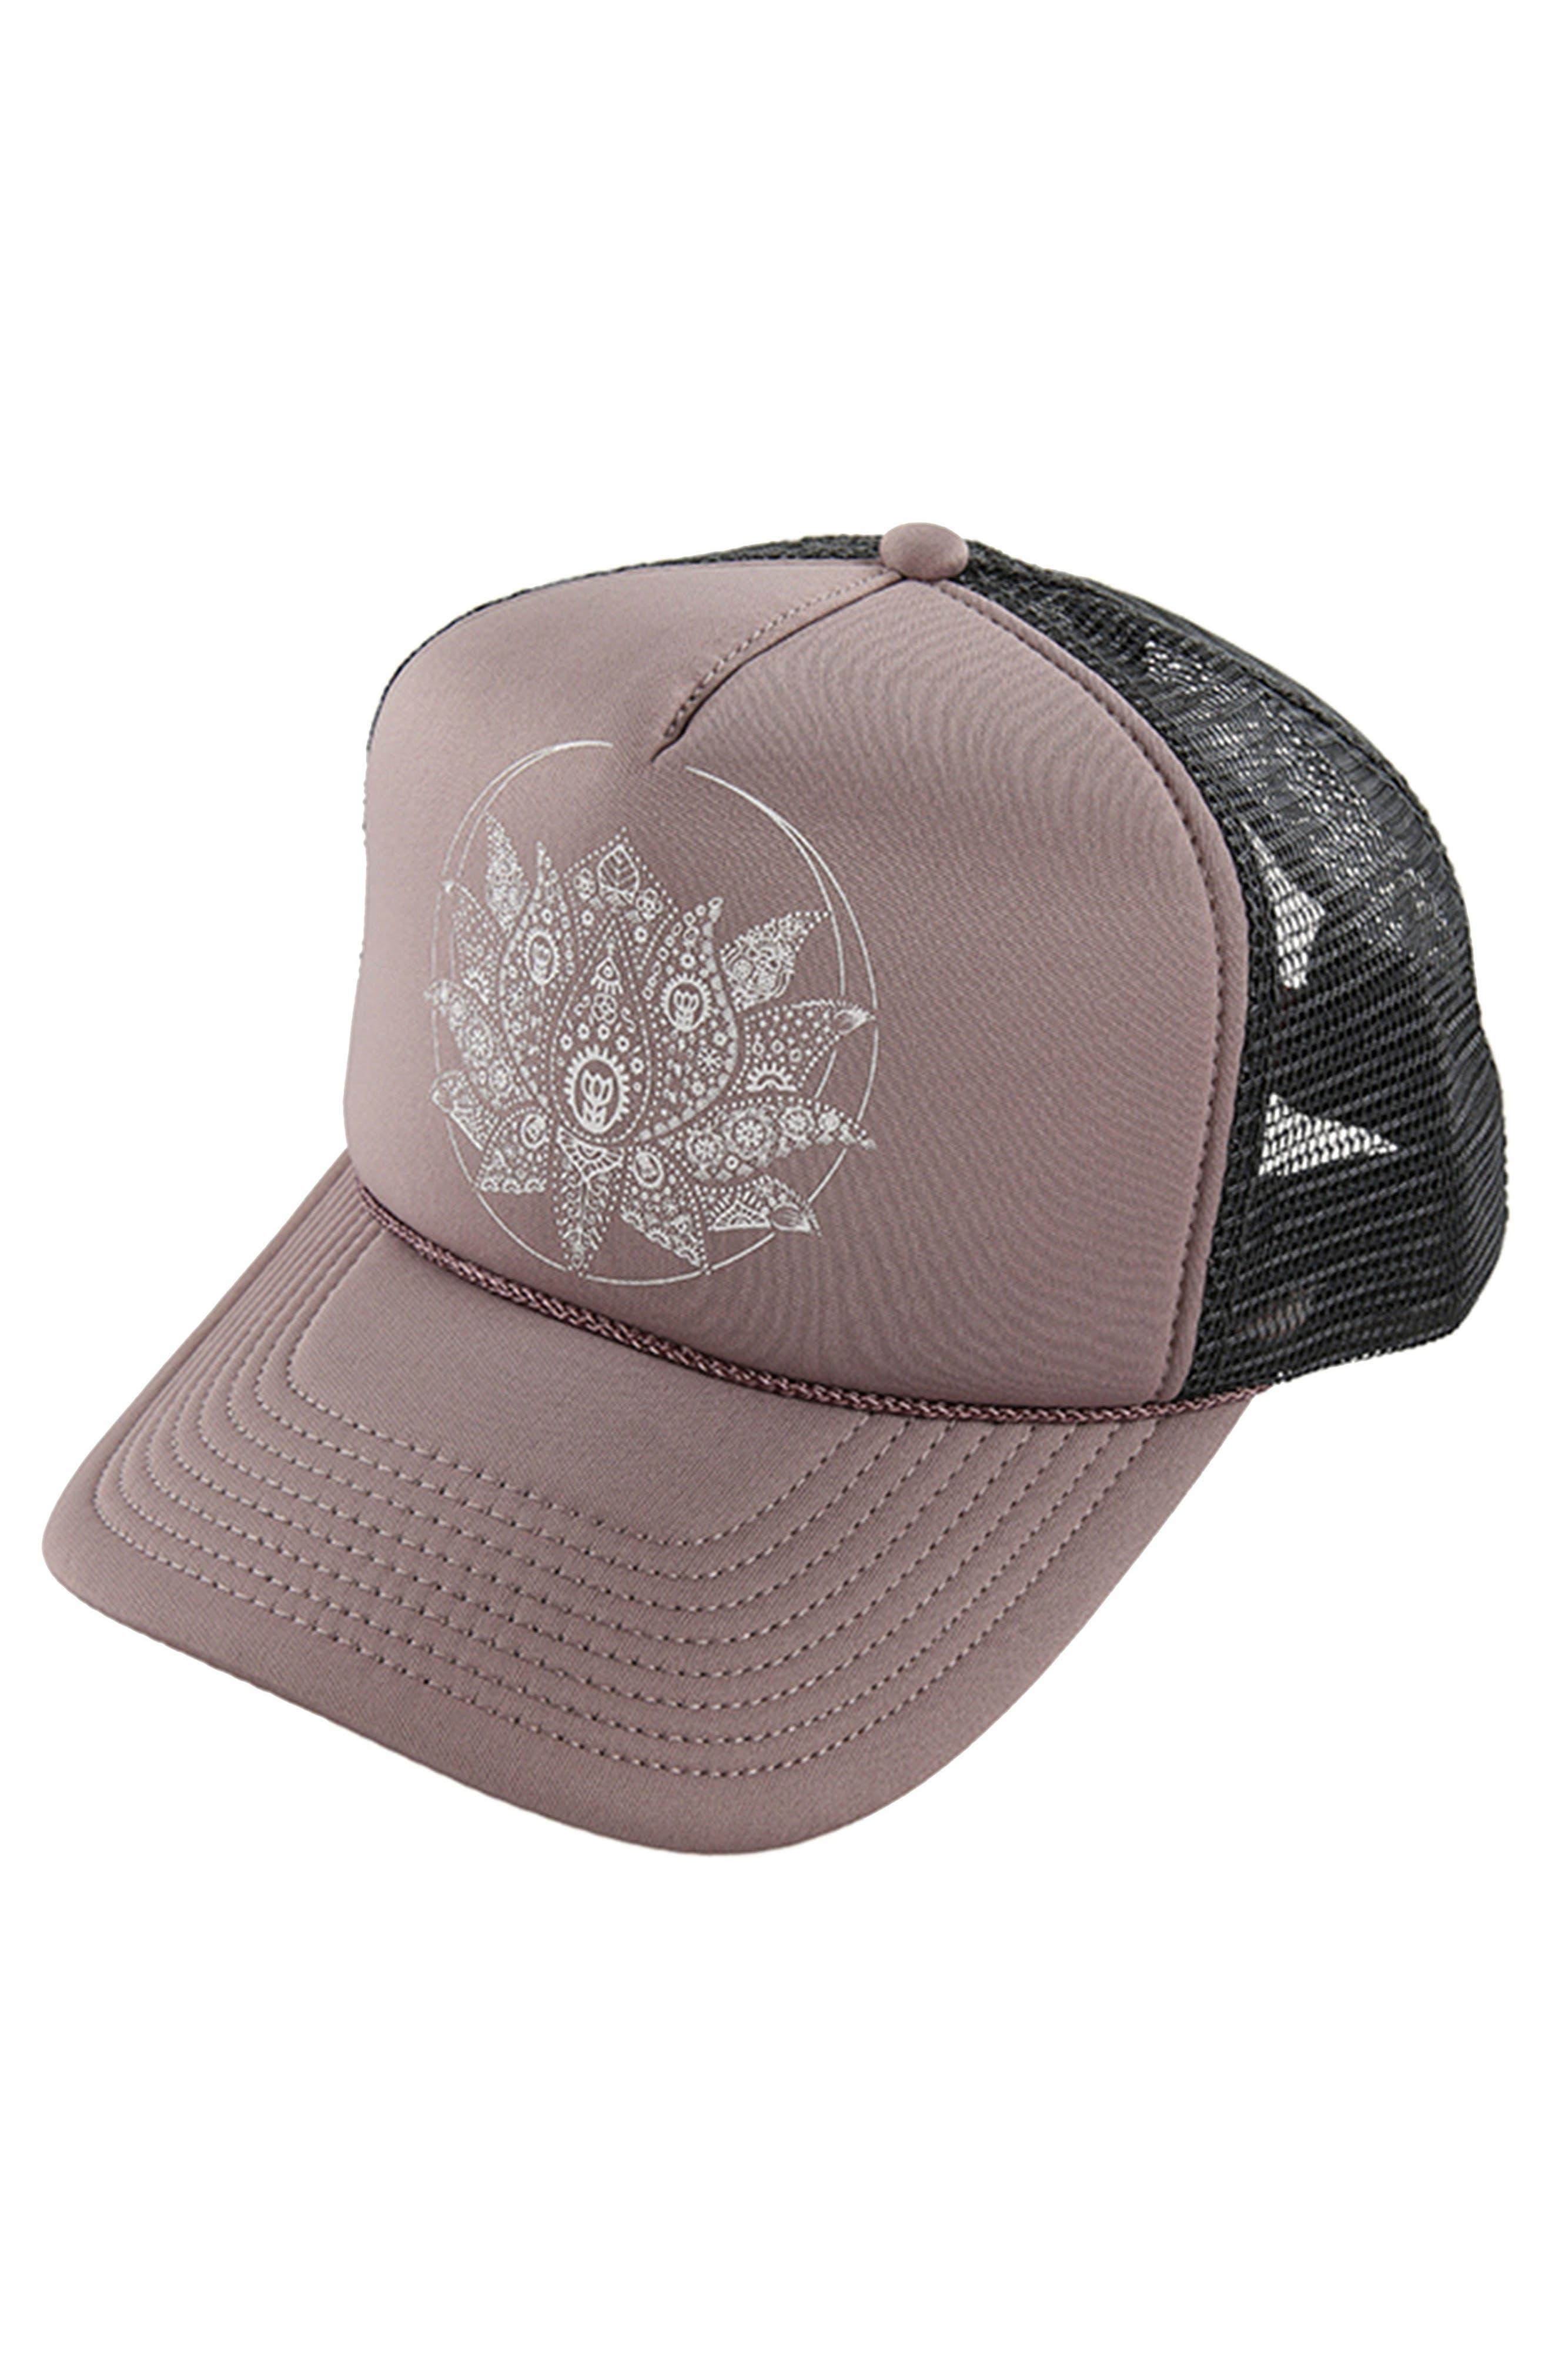 Zen Life Aloha Trucker Hat,                         Main,                         color, 509